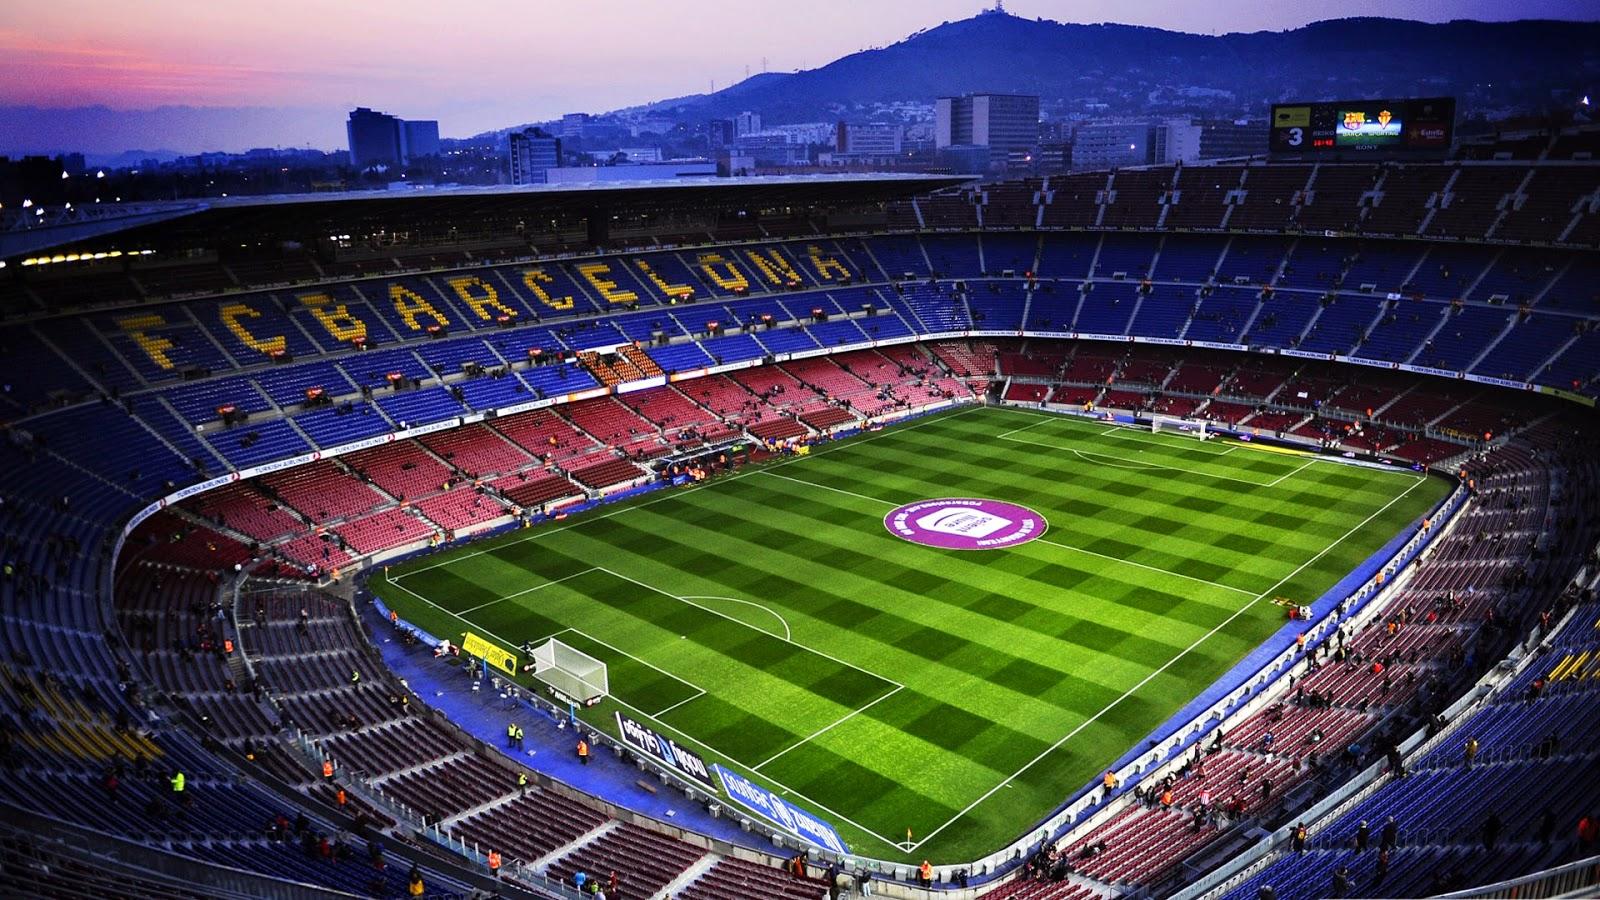 Stadium camp nou Barce...